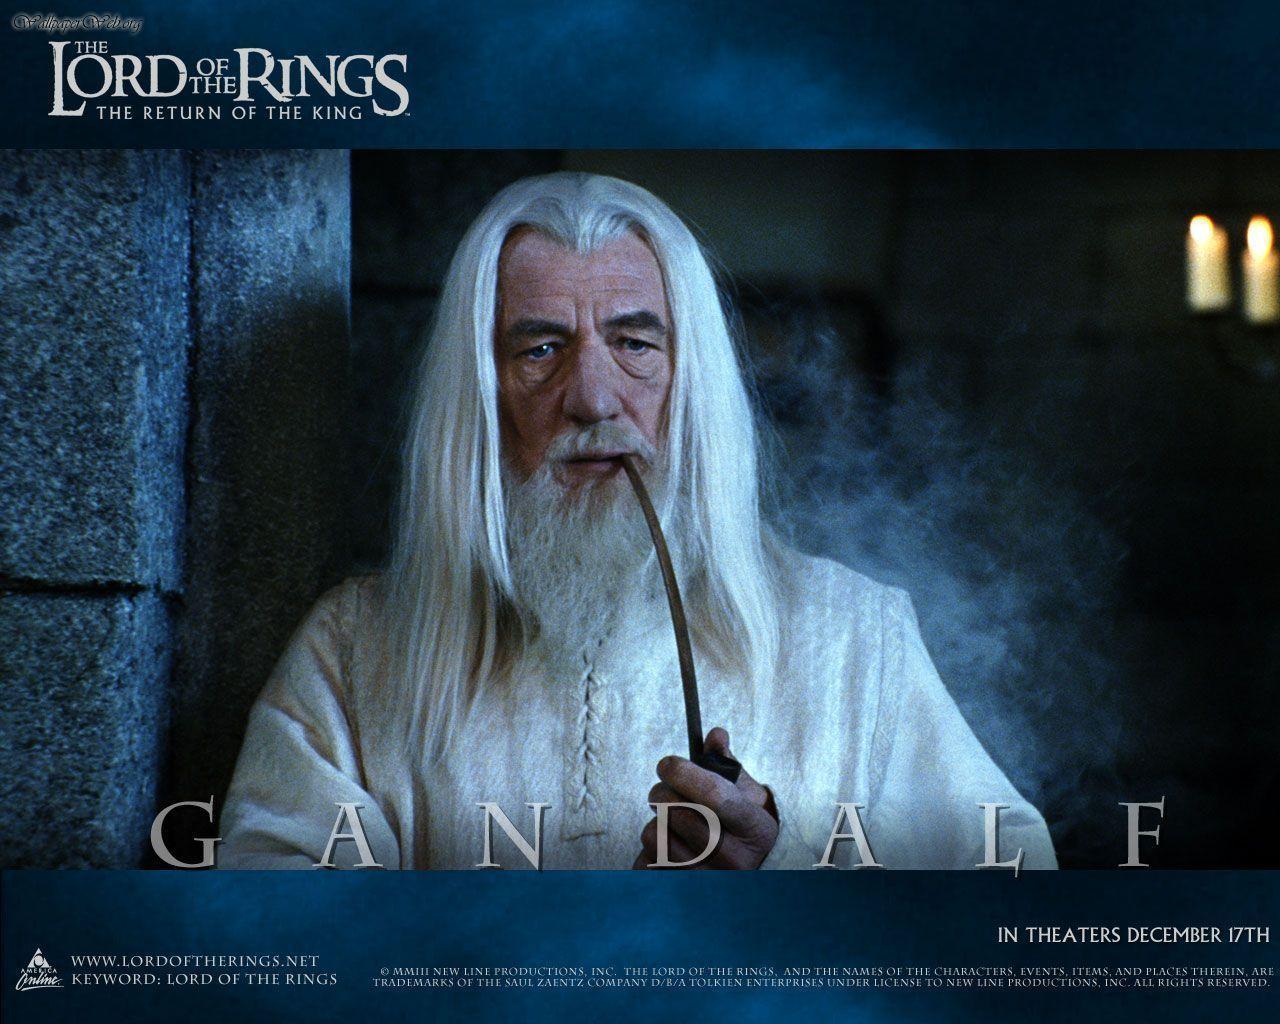 Gandalf   Gandalf Wallpaper 11311643 1280x1024